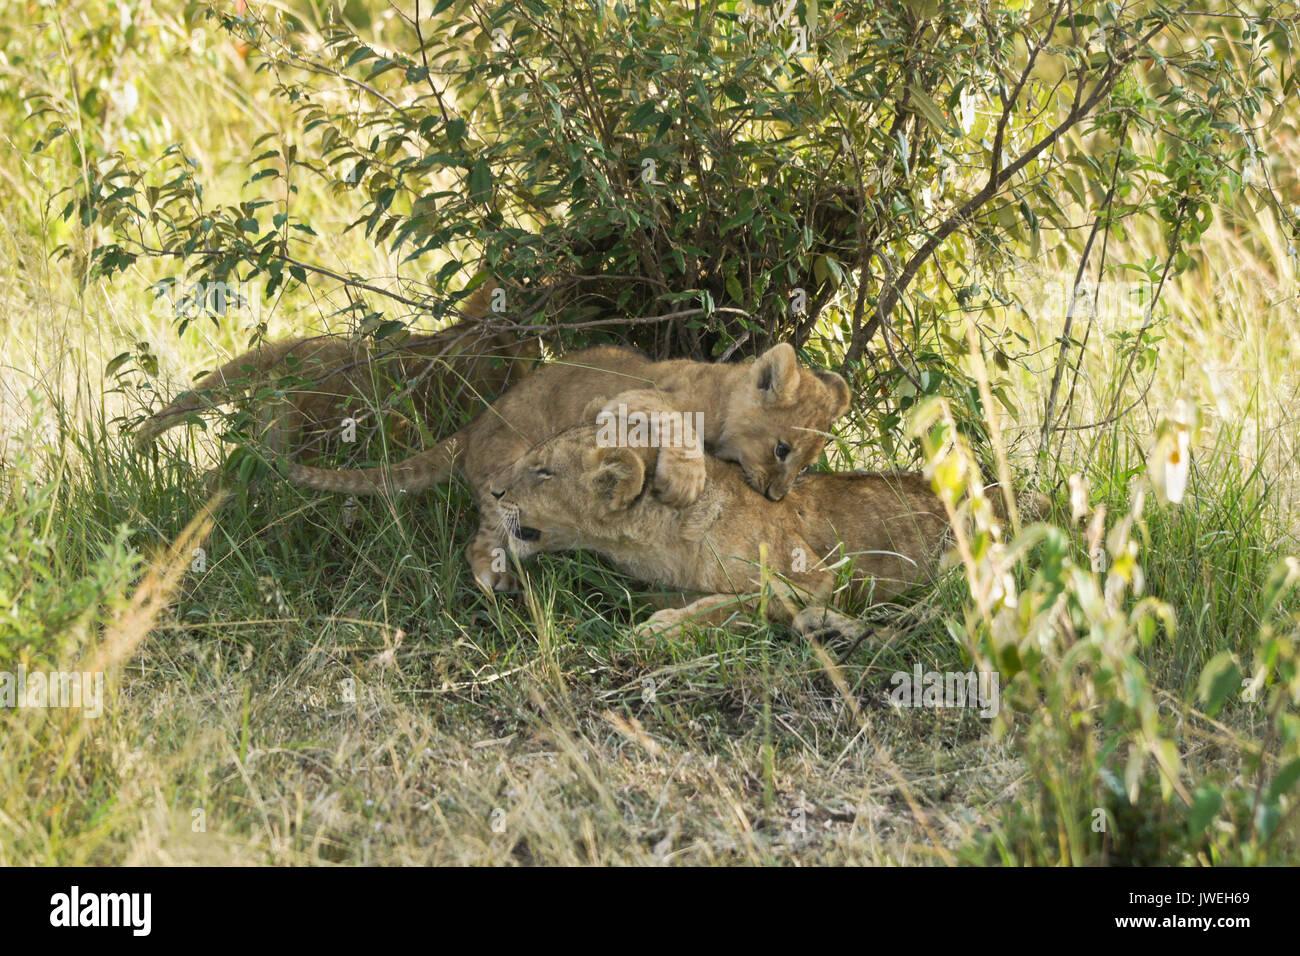 Tiny lion cub playing with older cub that was sleeping, Masai Mara Game Reserve, Kenya - Stock Image